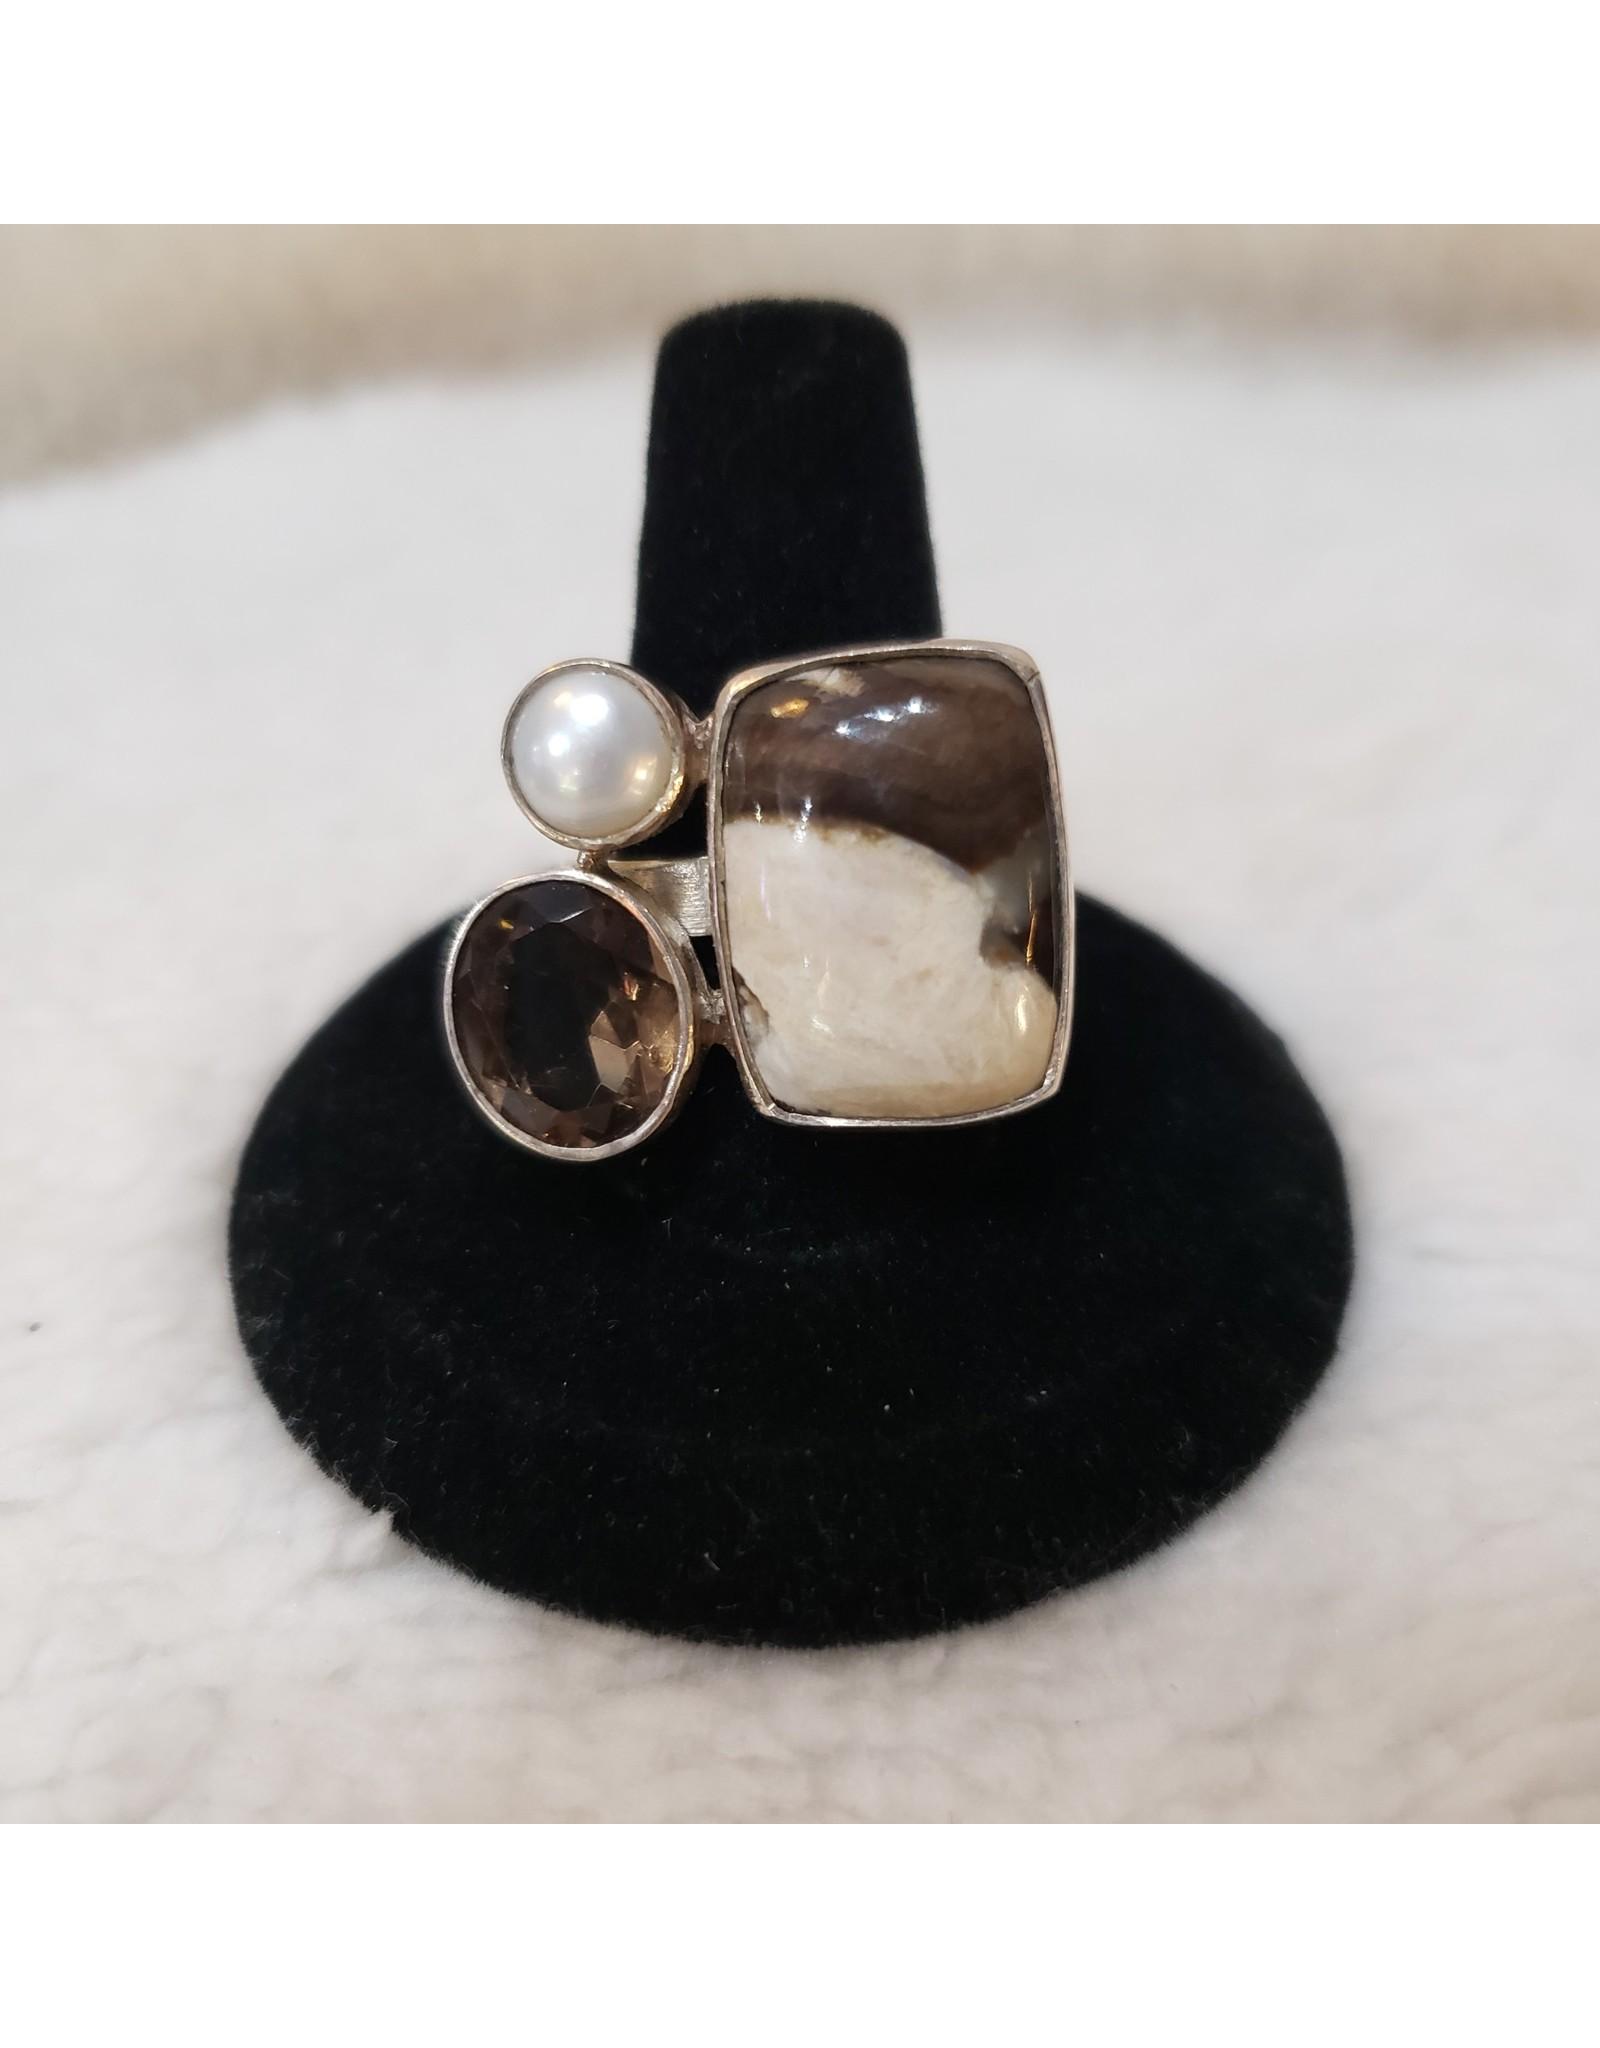 Sanchi and Filia P Designs Peanut Wood & Smoky Quartz Ring